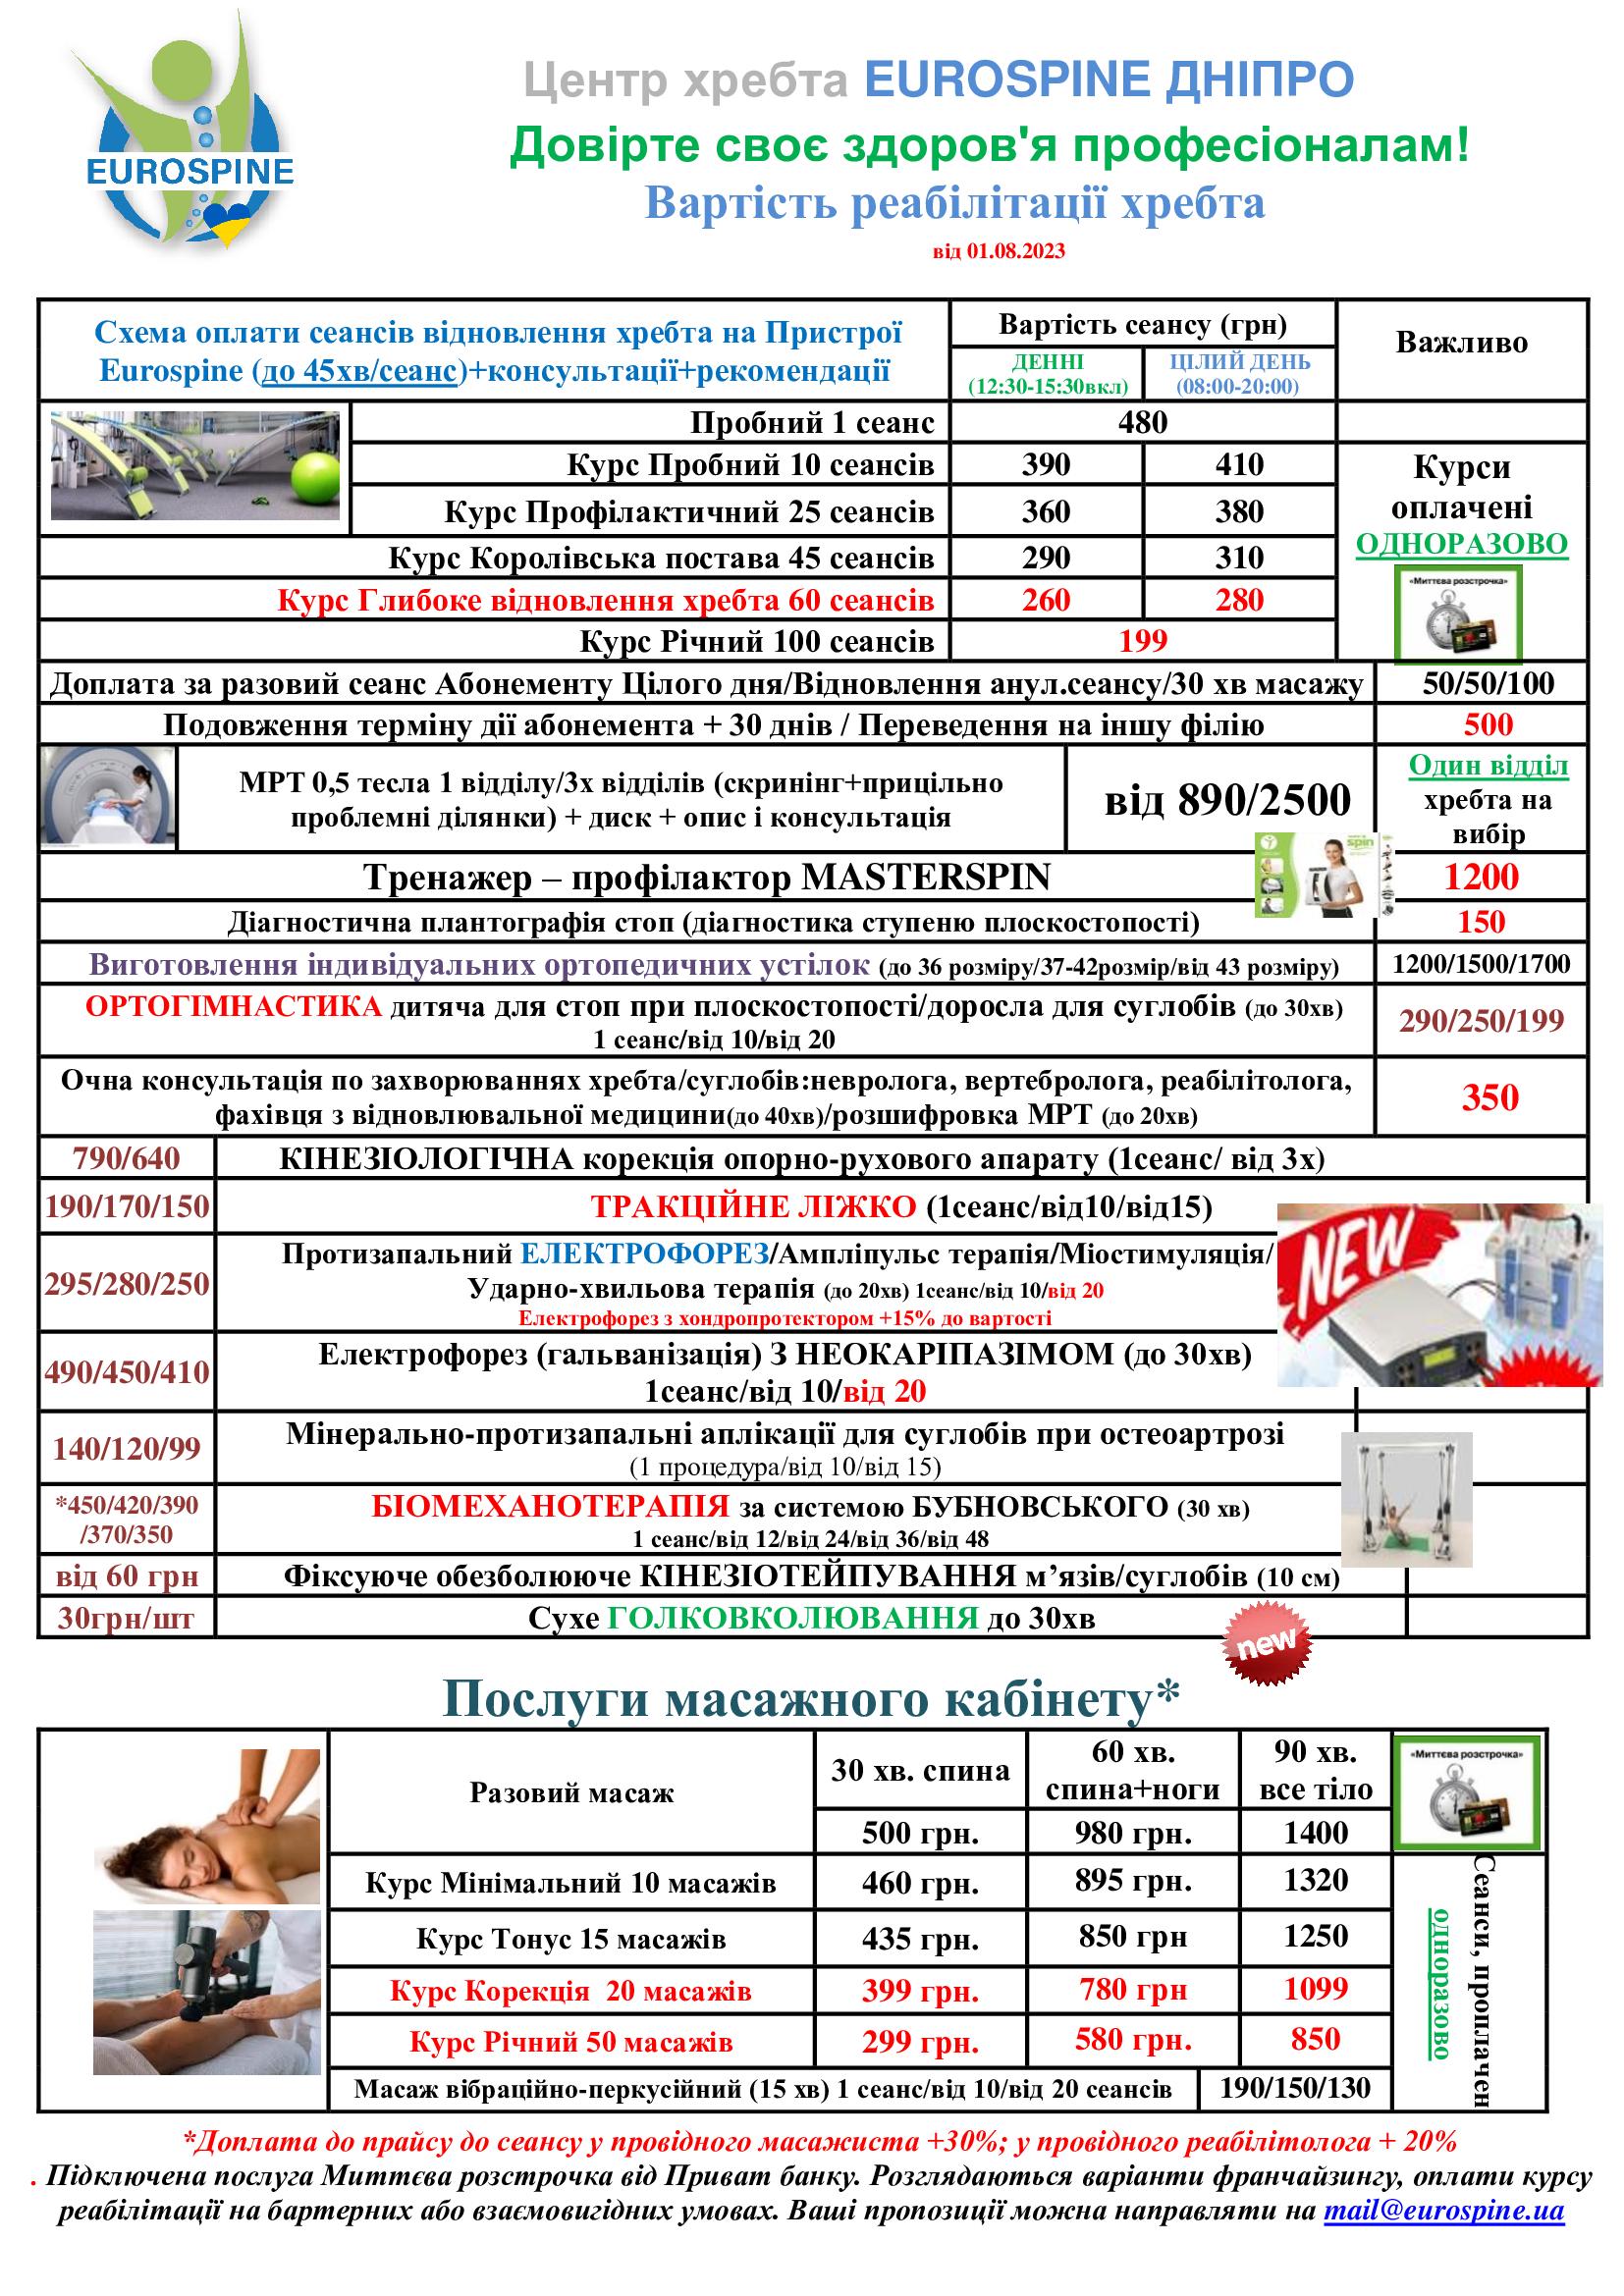 http://eurospine.ua/price/dnepr2.jpg